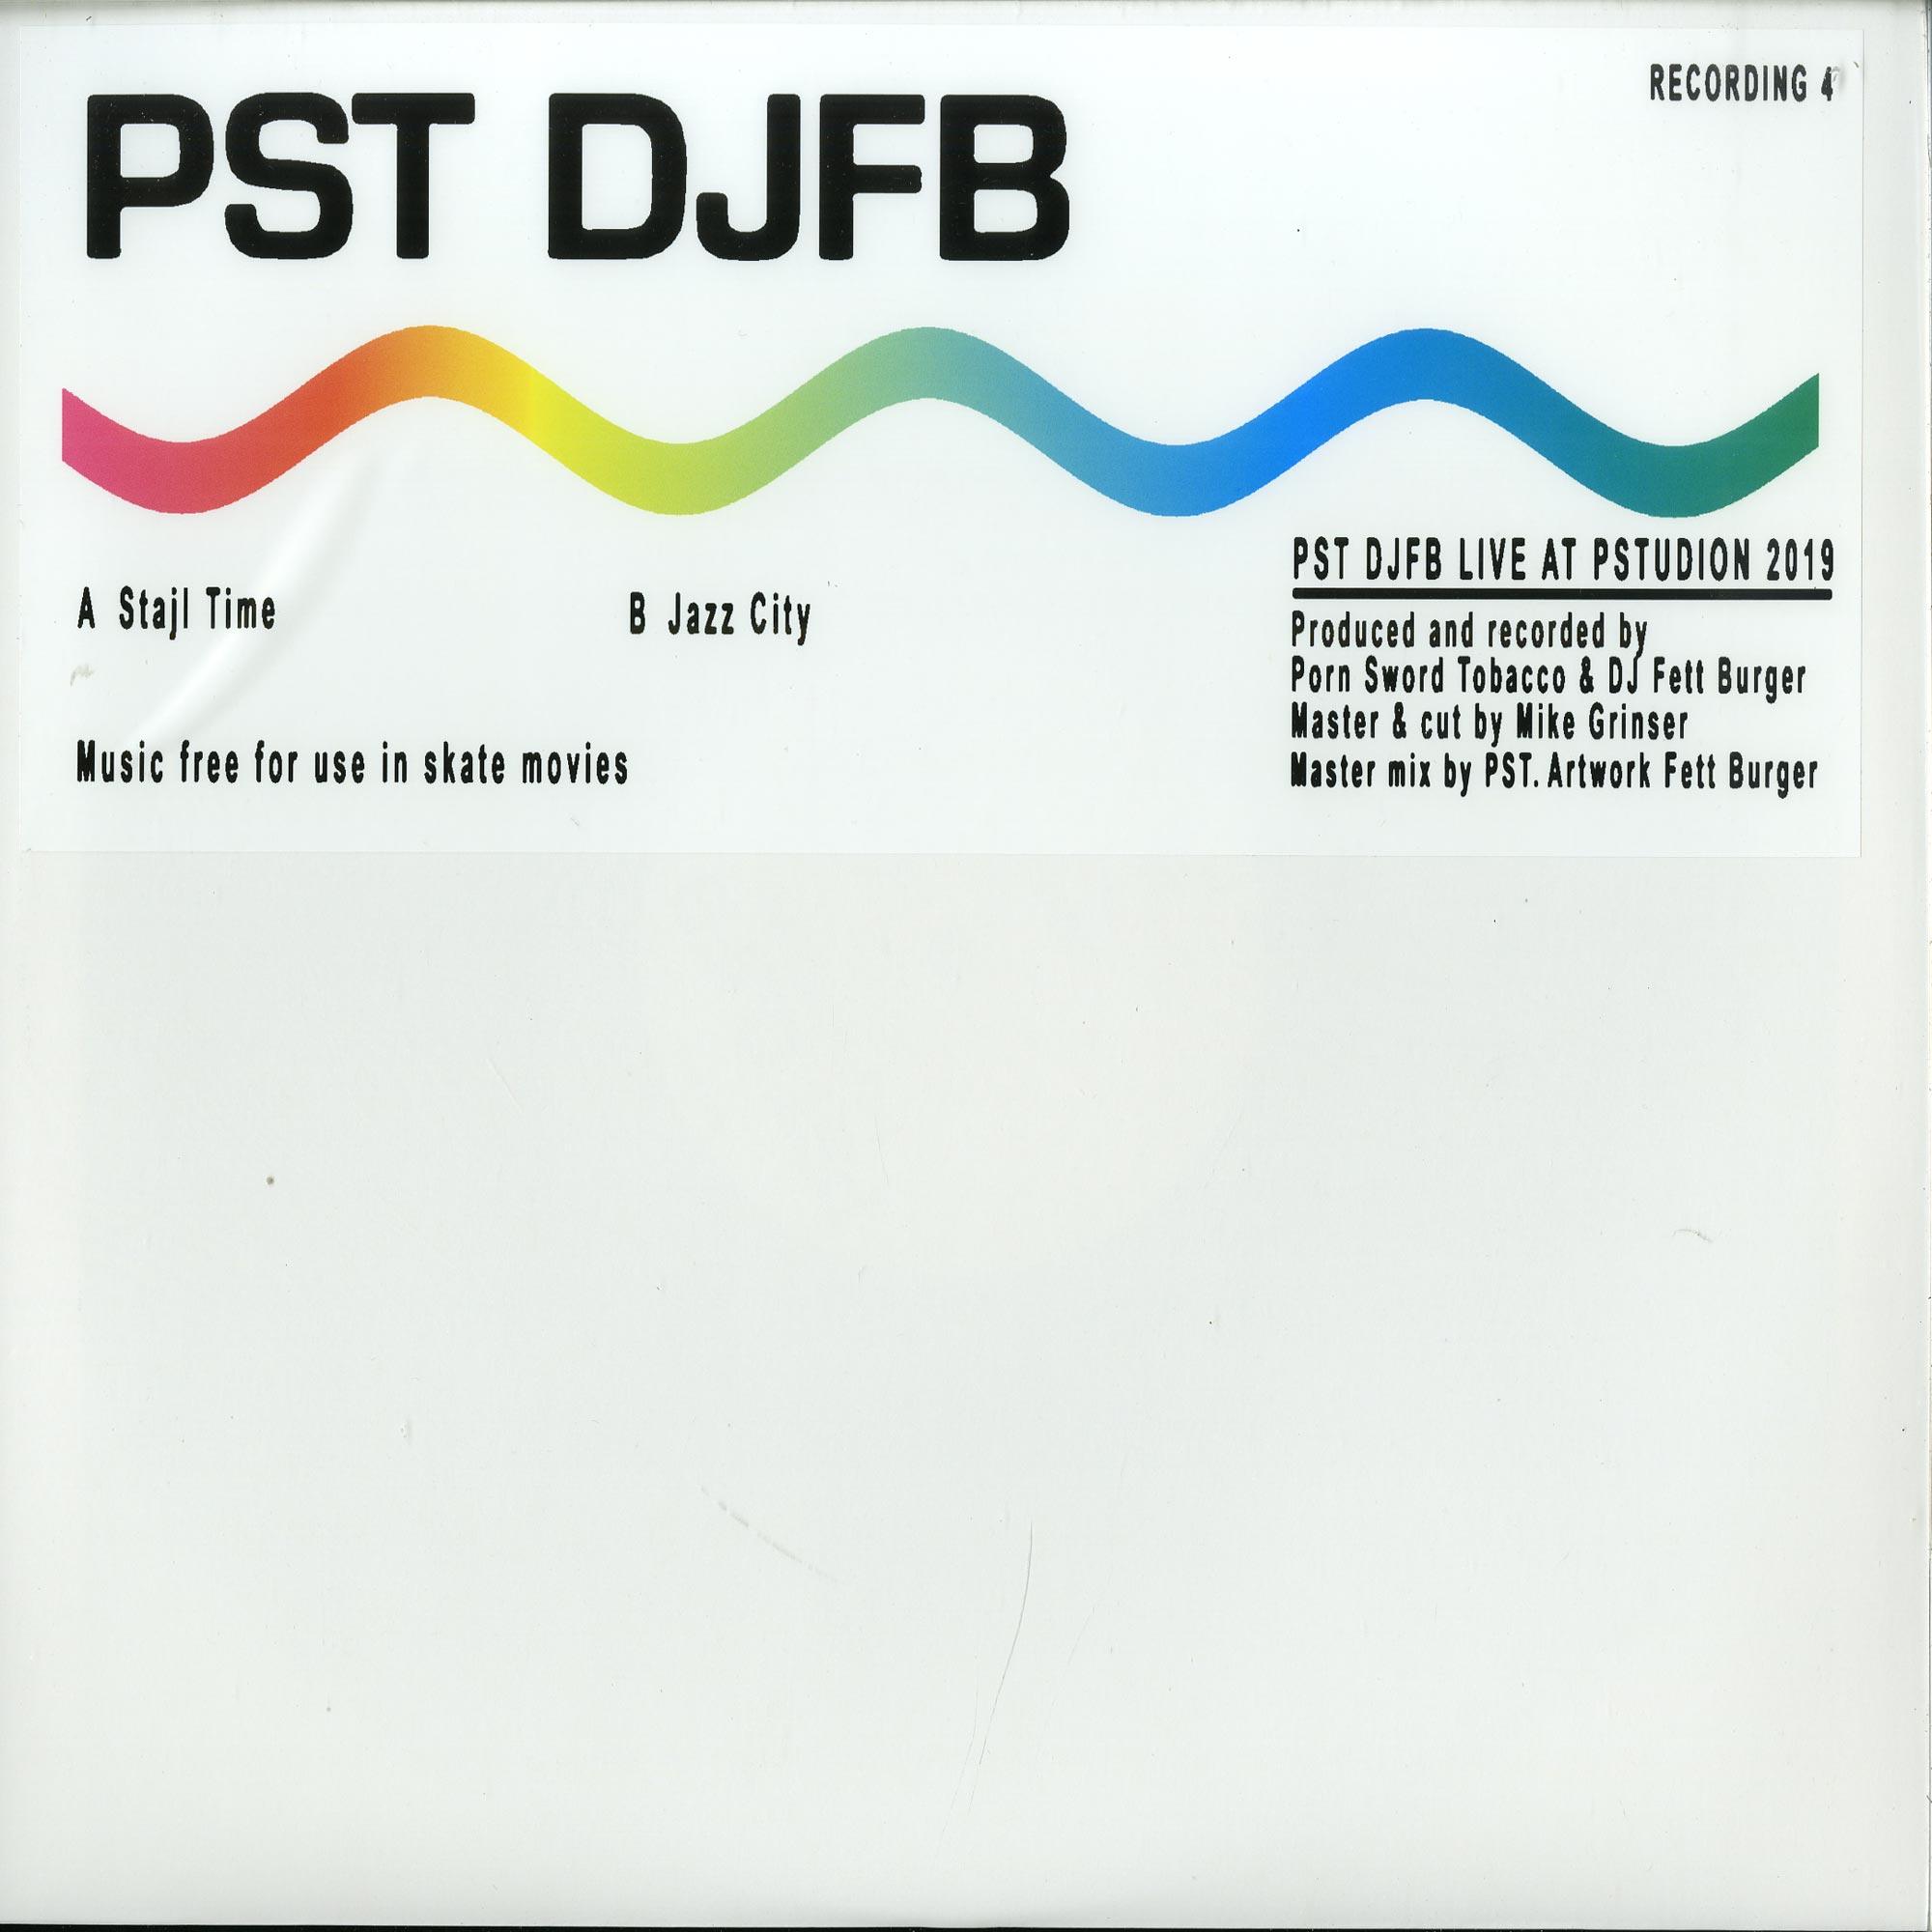 PST & DJFB - PST & DJFB LIVE AT PSTUDION 2019